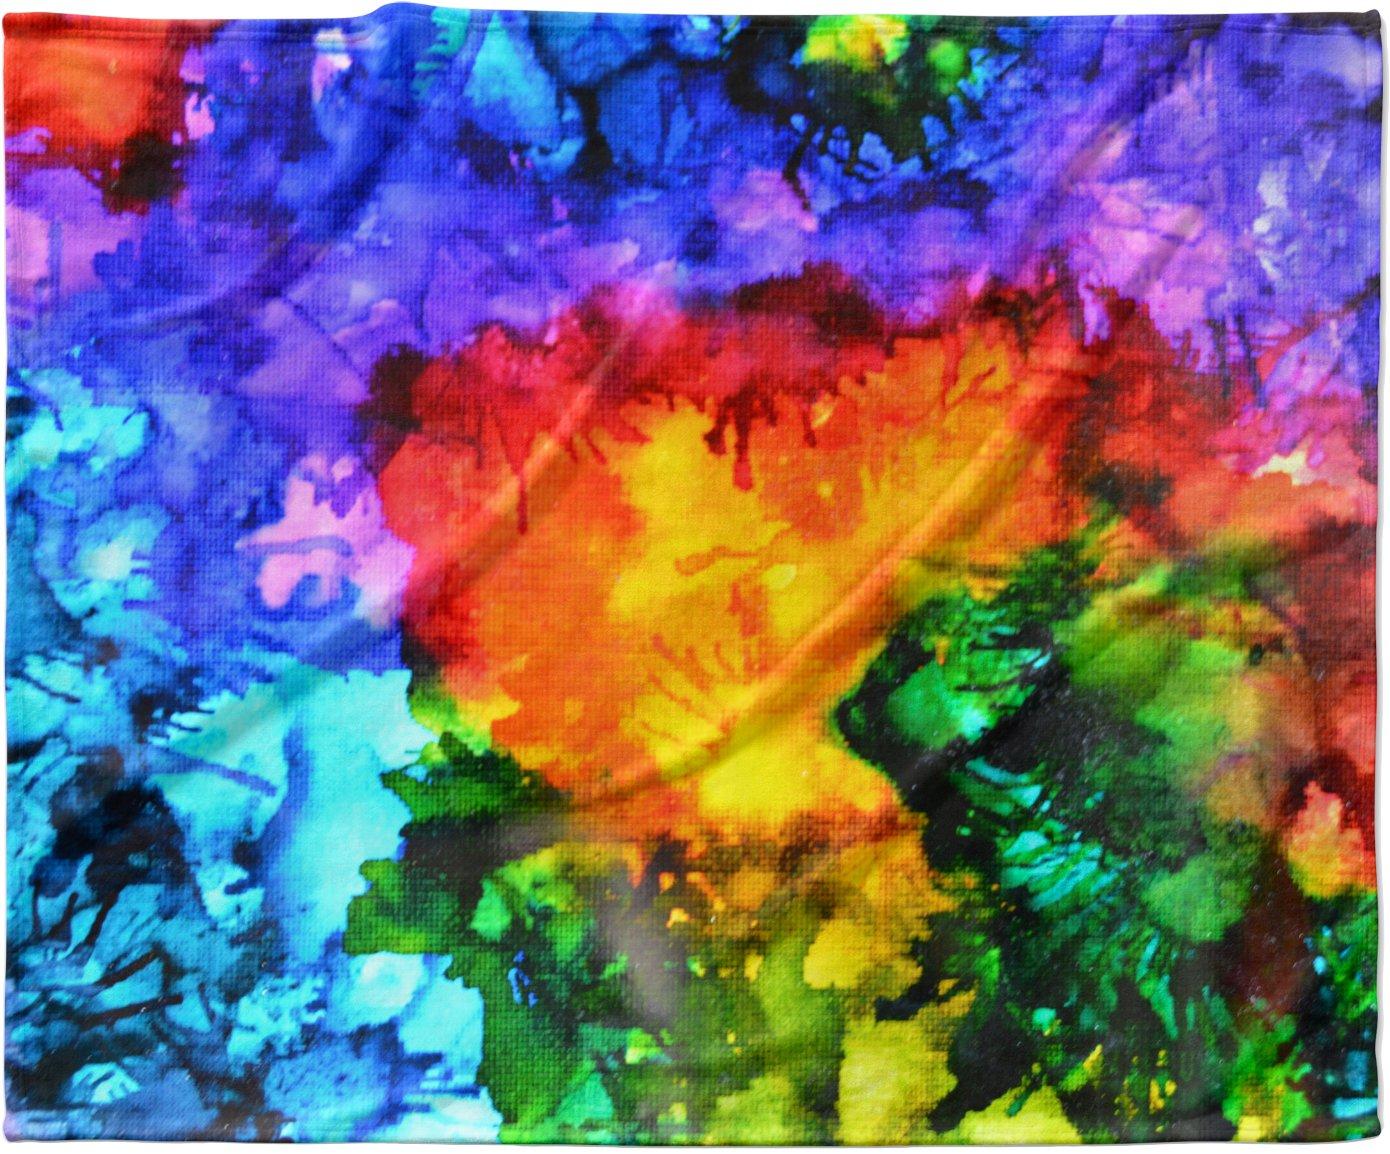 KESS InHouse Claire Day 'Karma' Rainbow Paint Fleece Baby Blanket, 40' x 30'